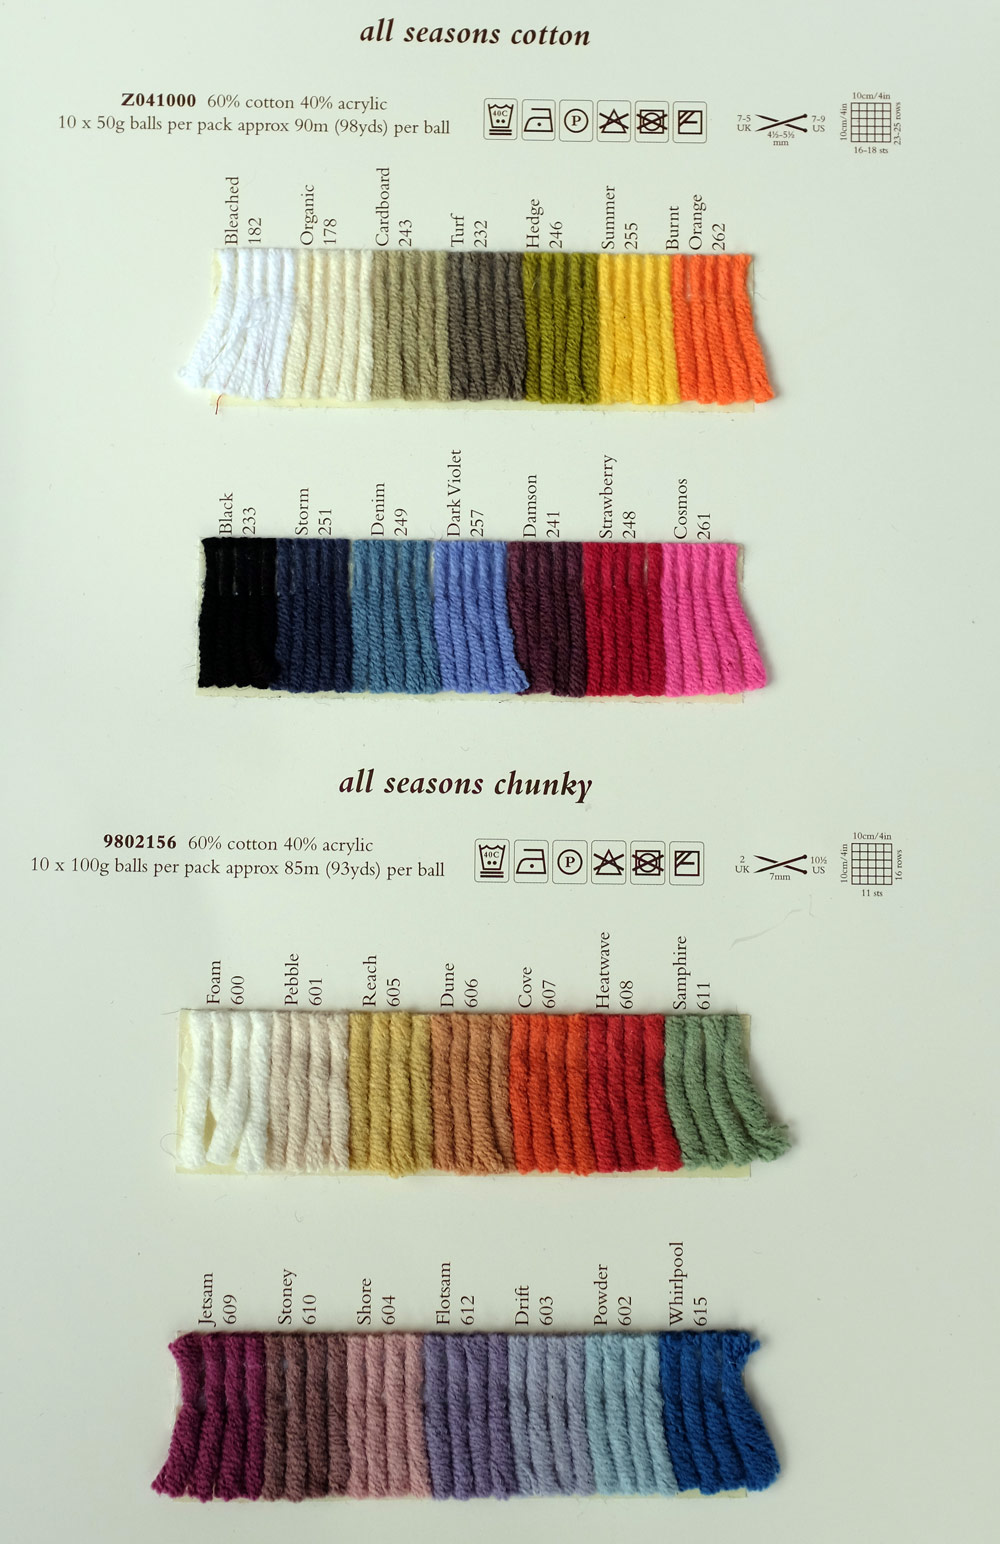 Knitting Patterns Rowan Wool Cotton : Rowan All Seasons Chunky - Rowan Yarns RYC Sirdar Sublime English Yarns knitt...